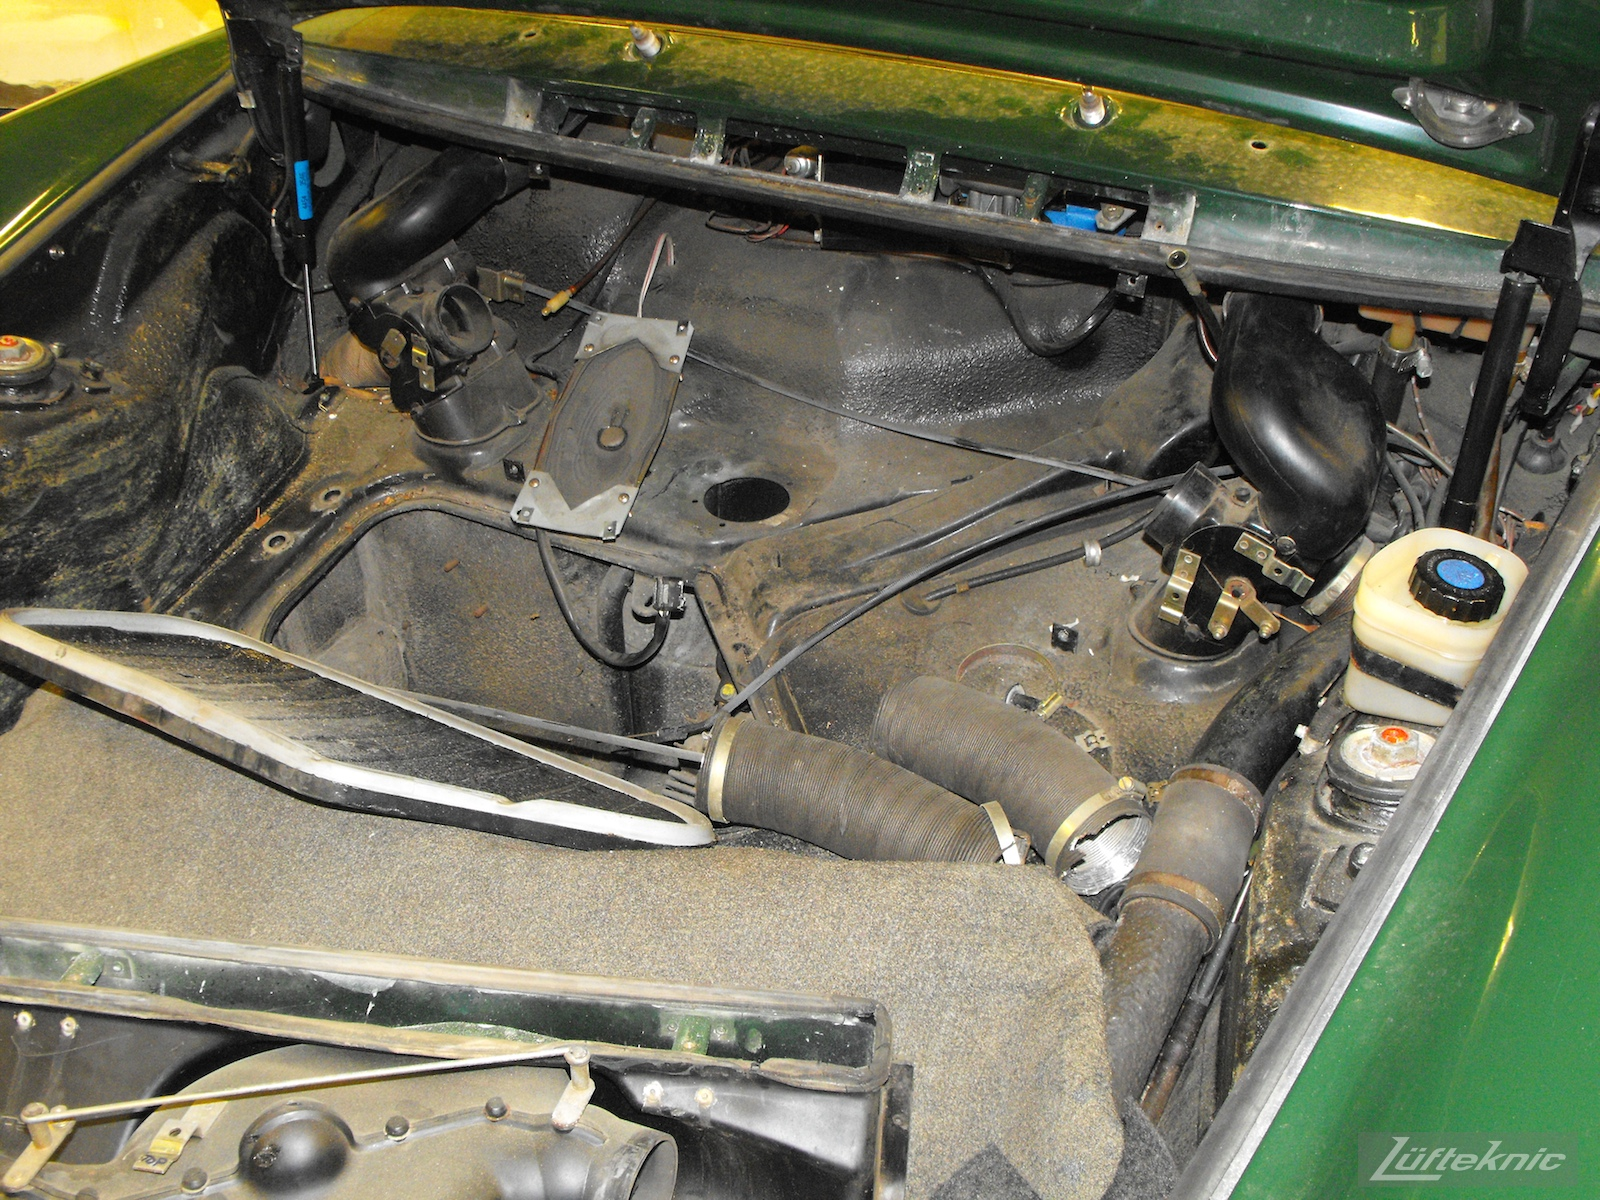 Under the hood of an Irish Green Porsche 912 undergoing restoration at Lufteknic.